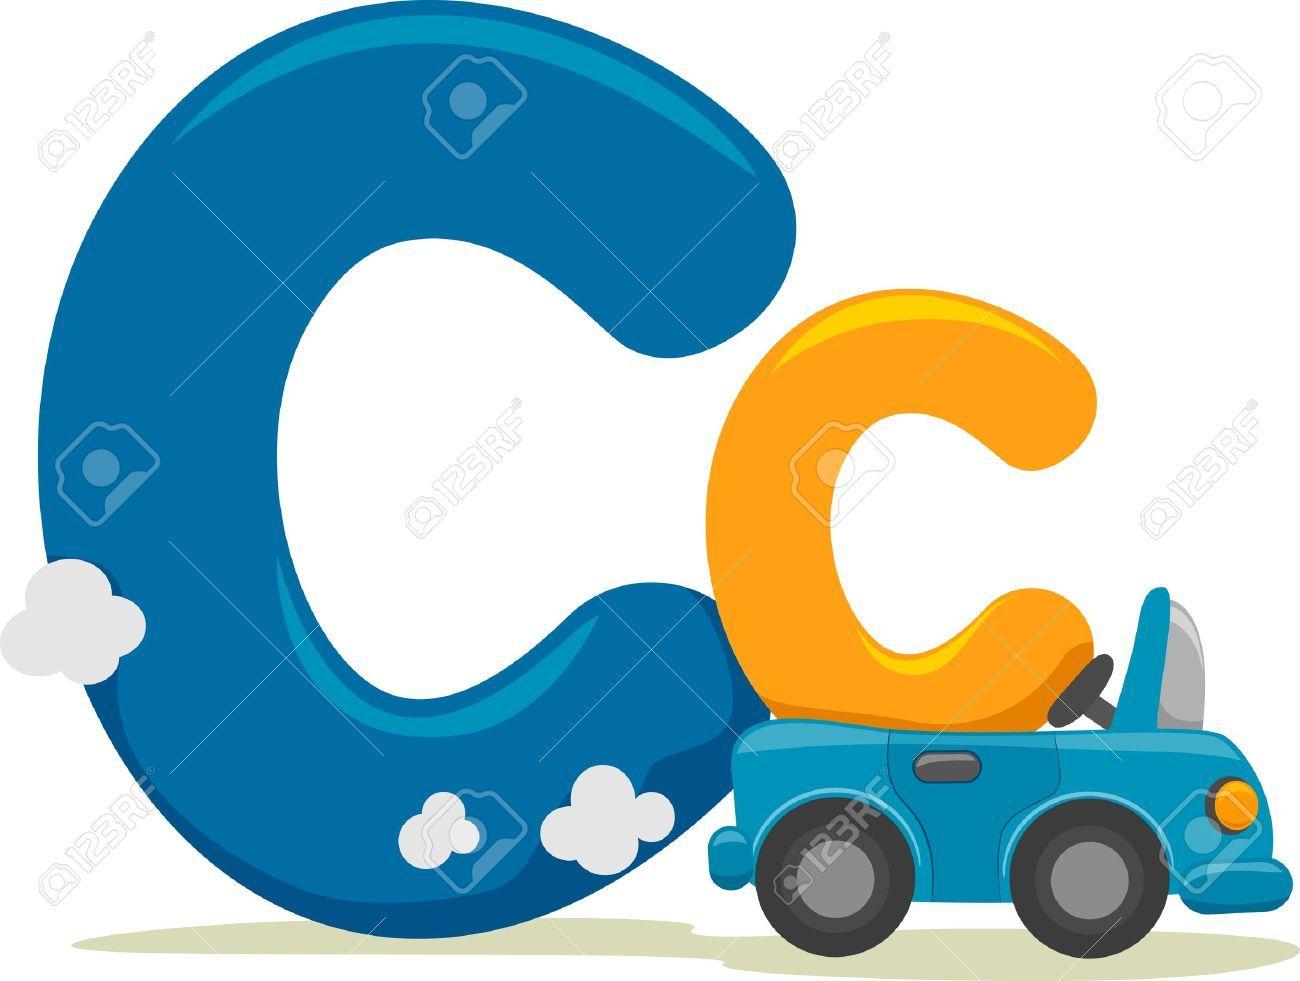 C clipart letter. Free clip class border